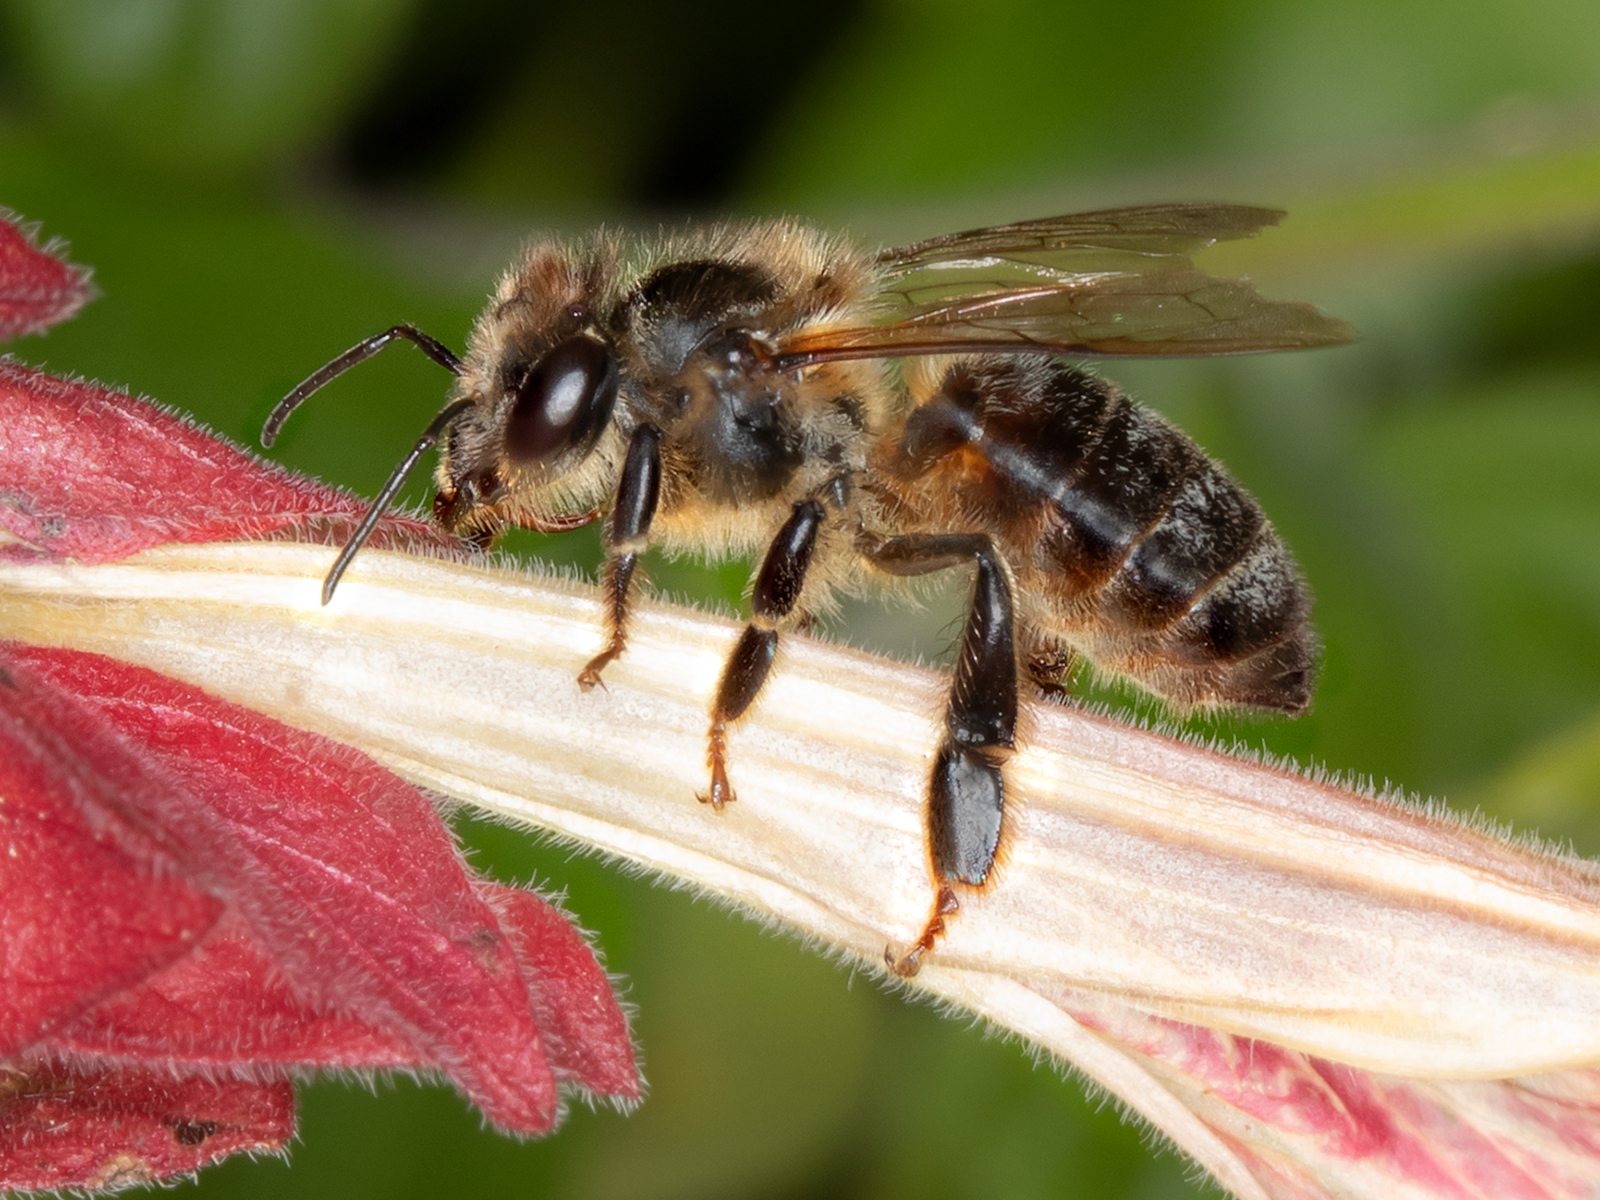 WJPEG-Honey-Bee-Black-CROP-FLA-#16-Wash-